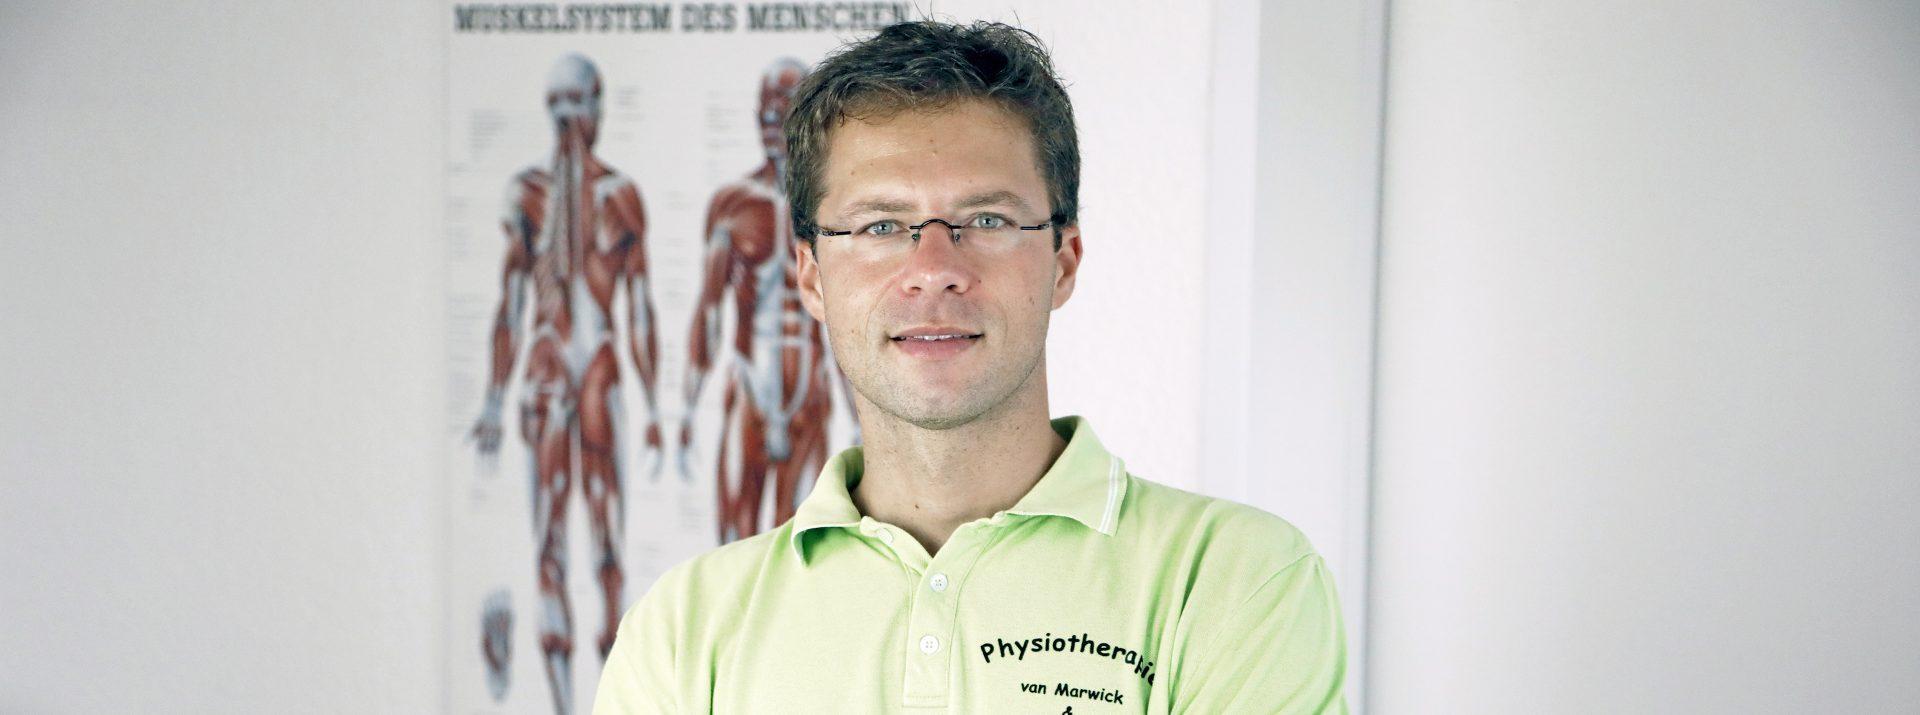 Physiotherapeut Georg Timmler